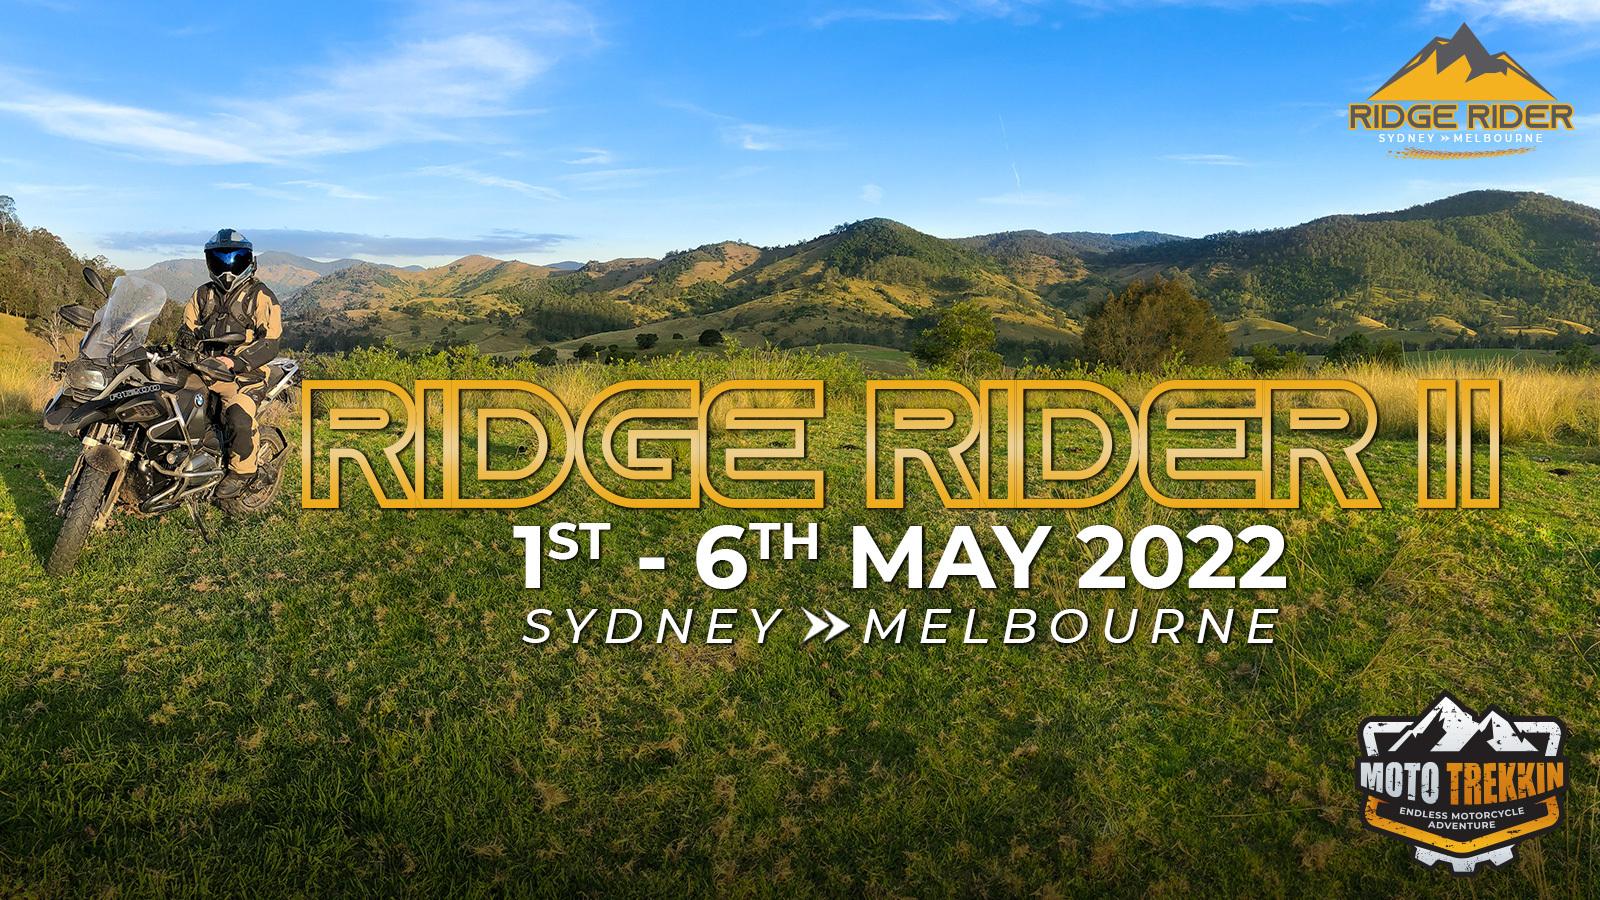 Ridge Rider 2022